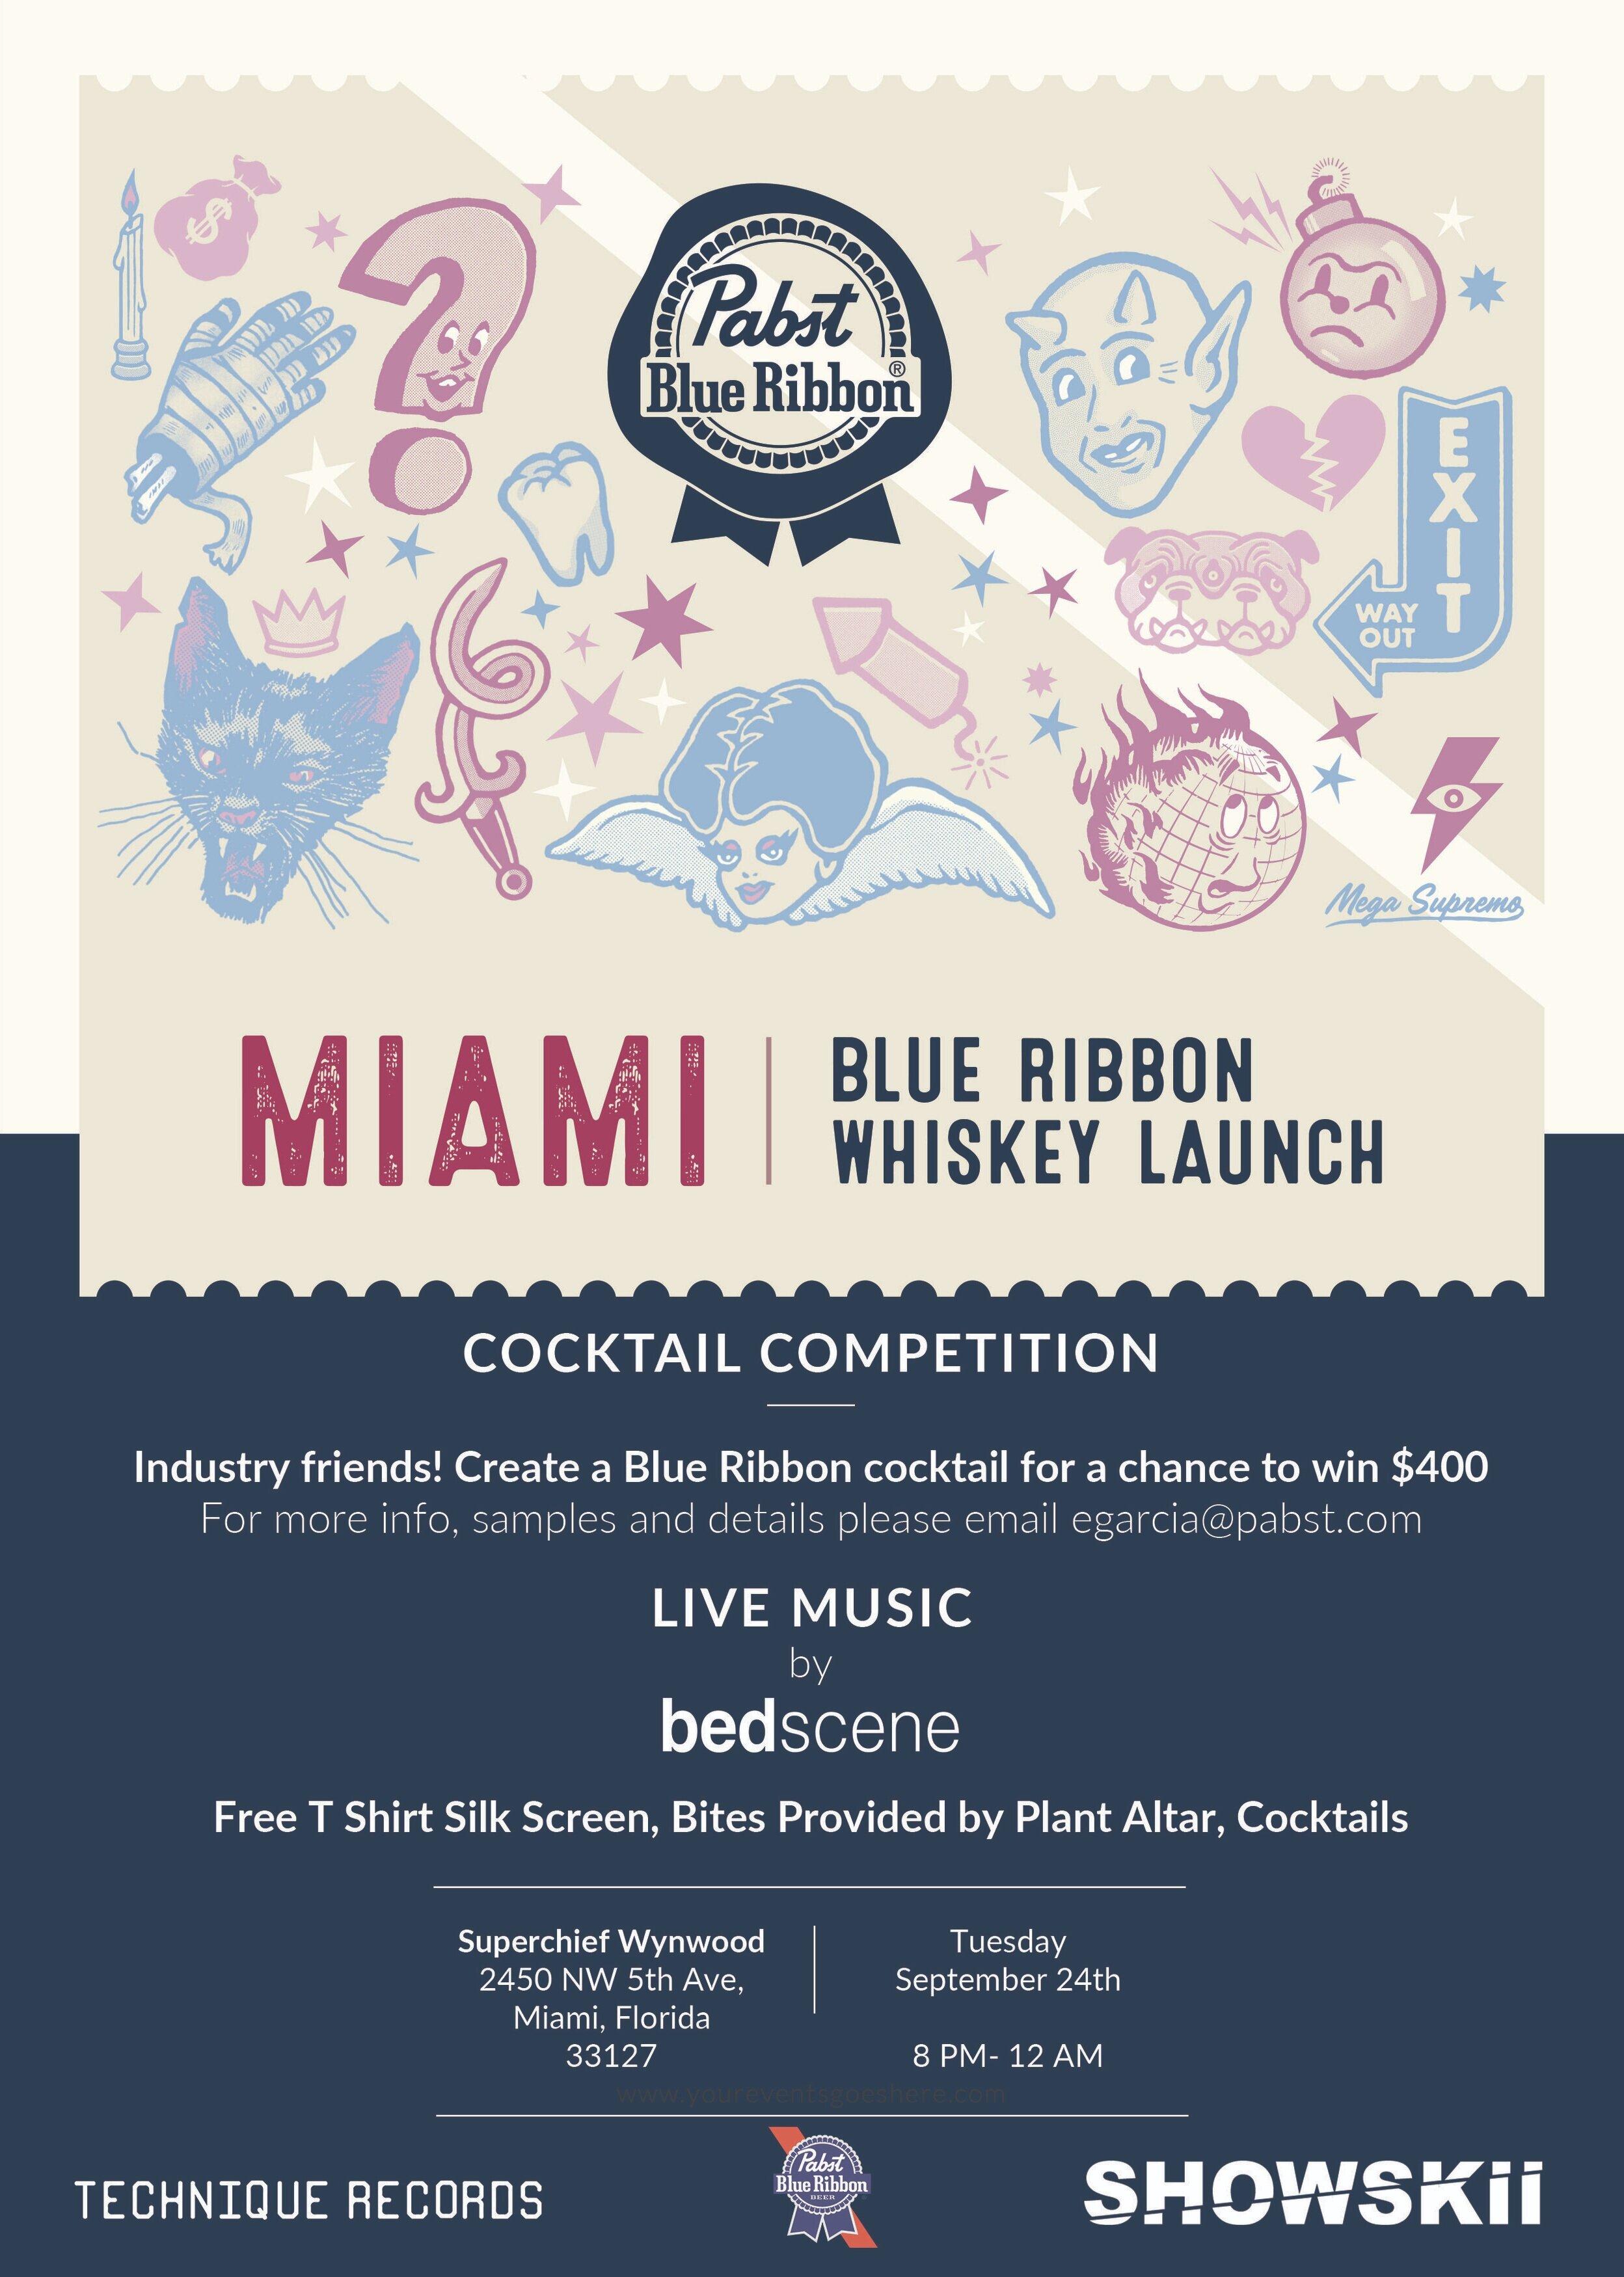 Pabst Whiskey Launch Digital Invitation.jpg